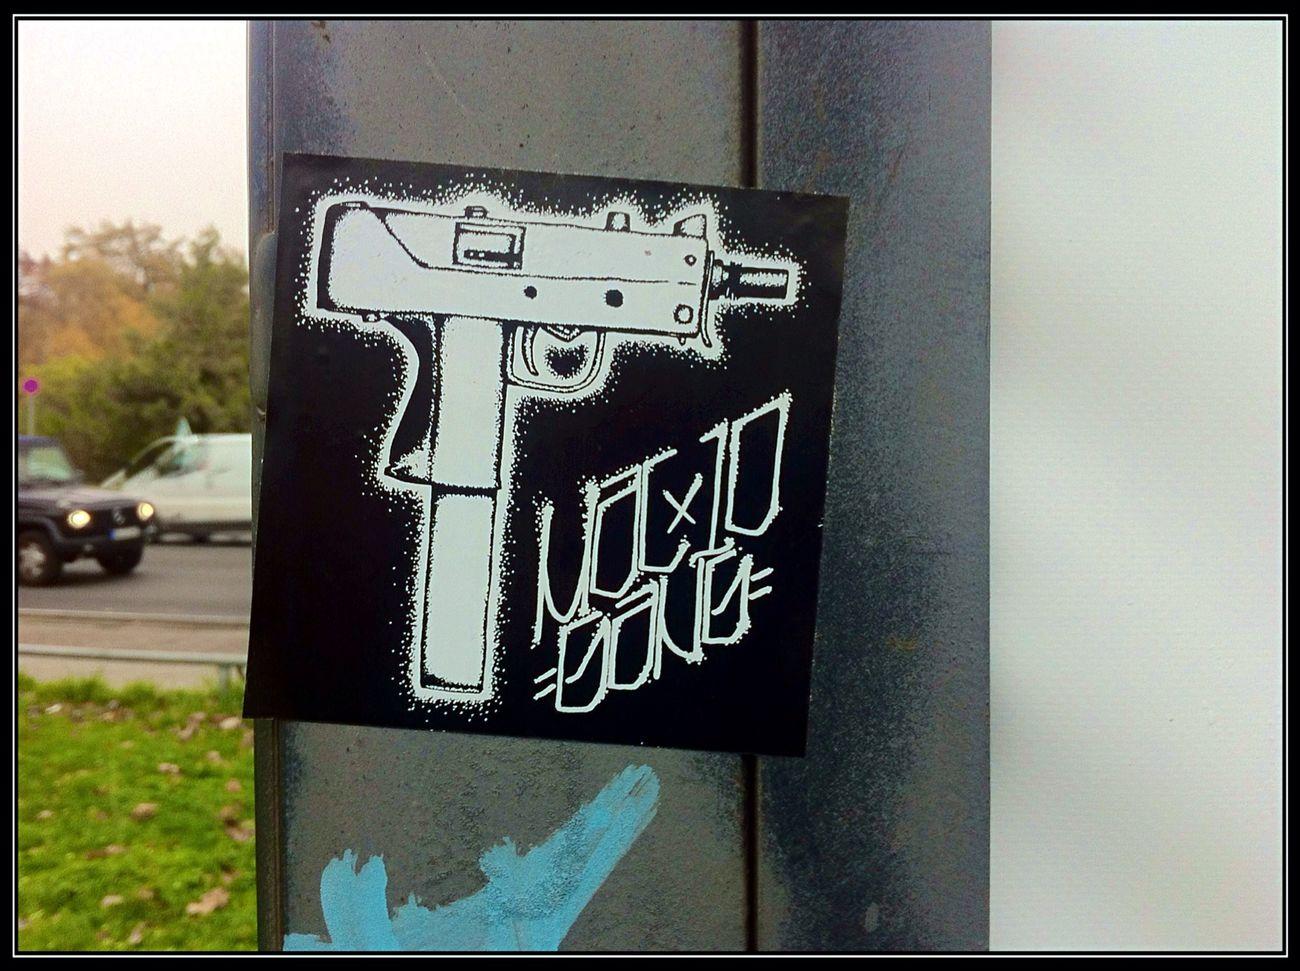 """ Mac10 Gang "" | Stickerart | Streetart | Street Art @ Arena-Berlin | Club Der Visionäre, Schlesische Straße"